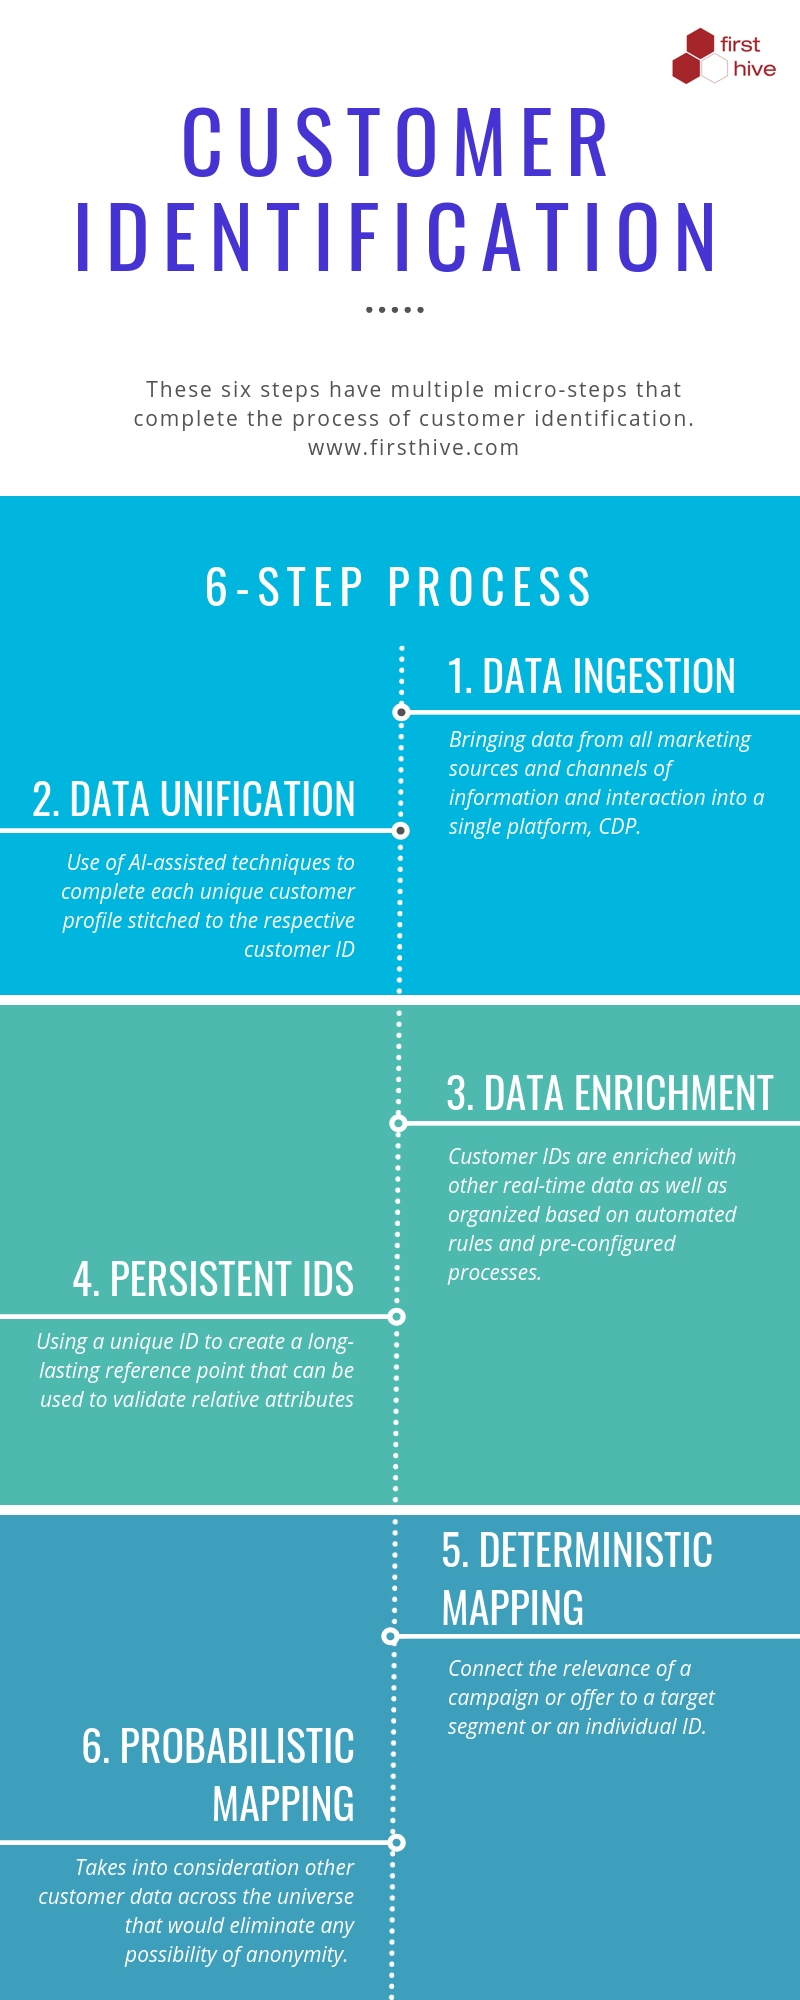 Customer identification process